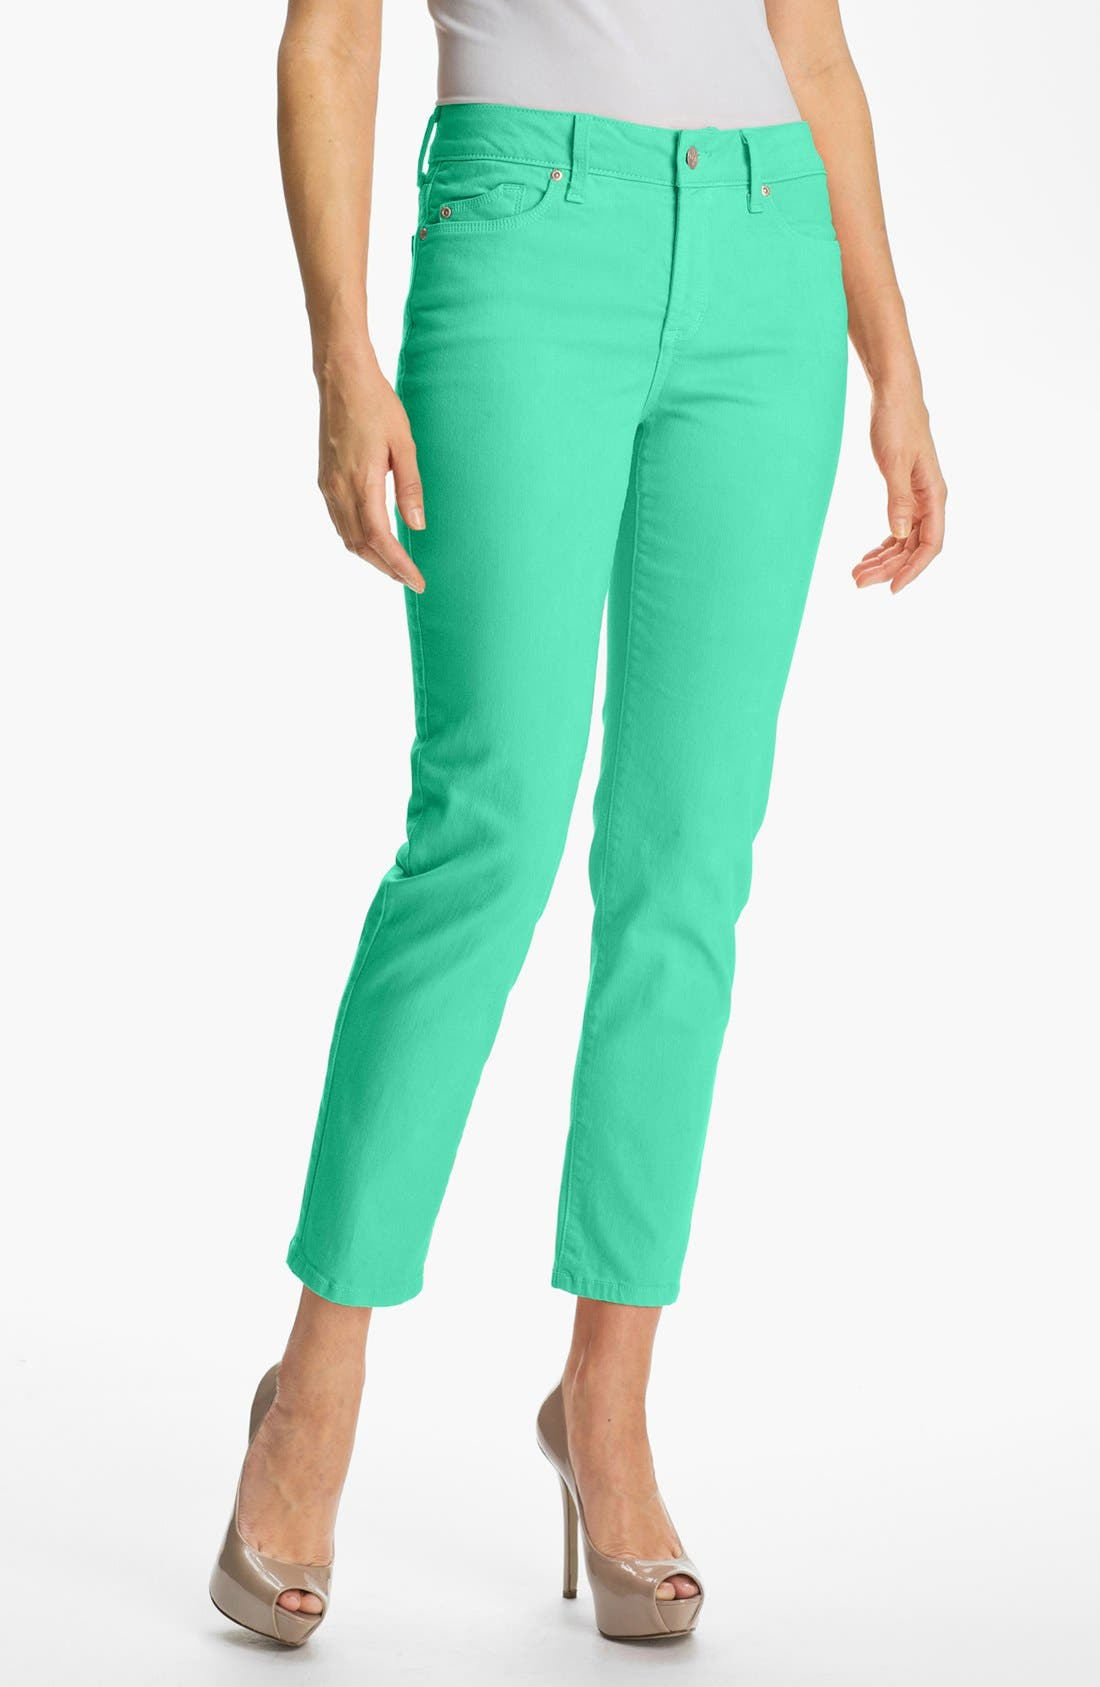 Main Image - NYDJ 'Alisha' Skinny Stretch Ankle Jeans (Petite)